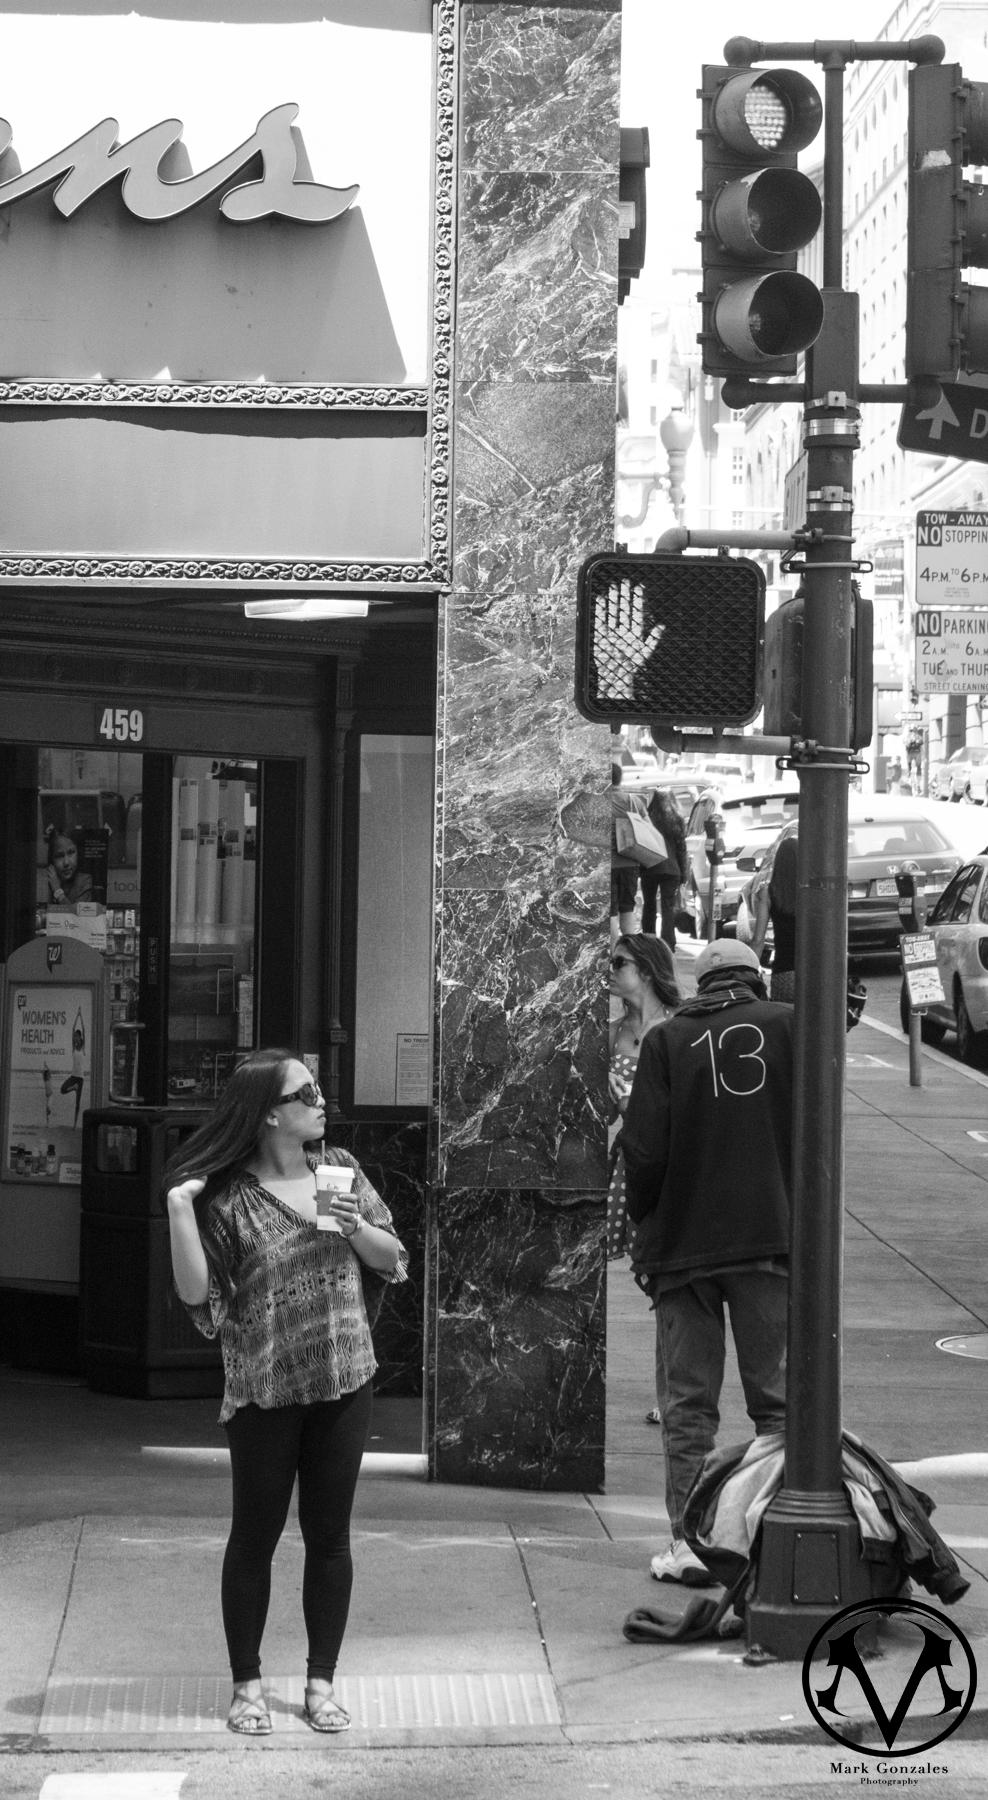 Street Photos - 6/14/2014